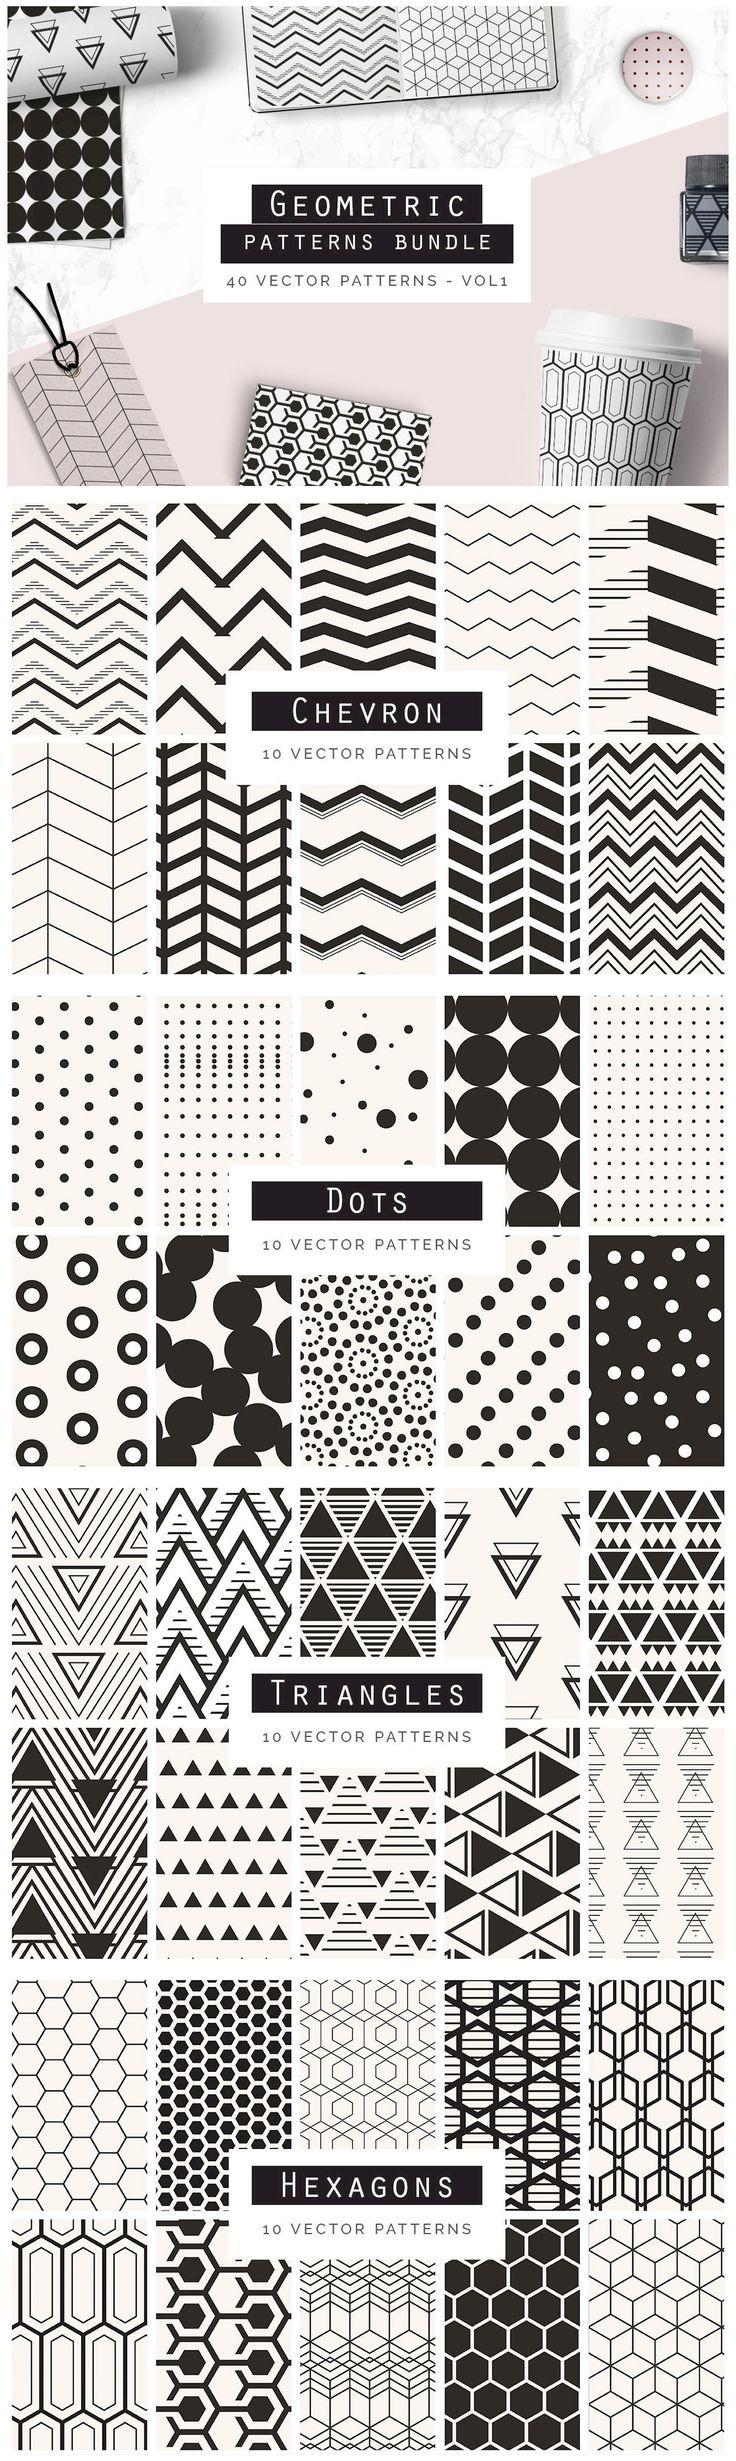 Geometric Patterns Bundle V1 - A great bundle of 40 Geometric Seamless Vector Patterns. These patterns are ...